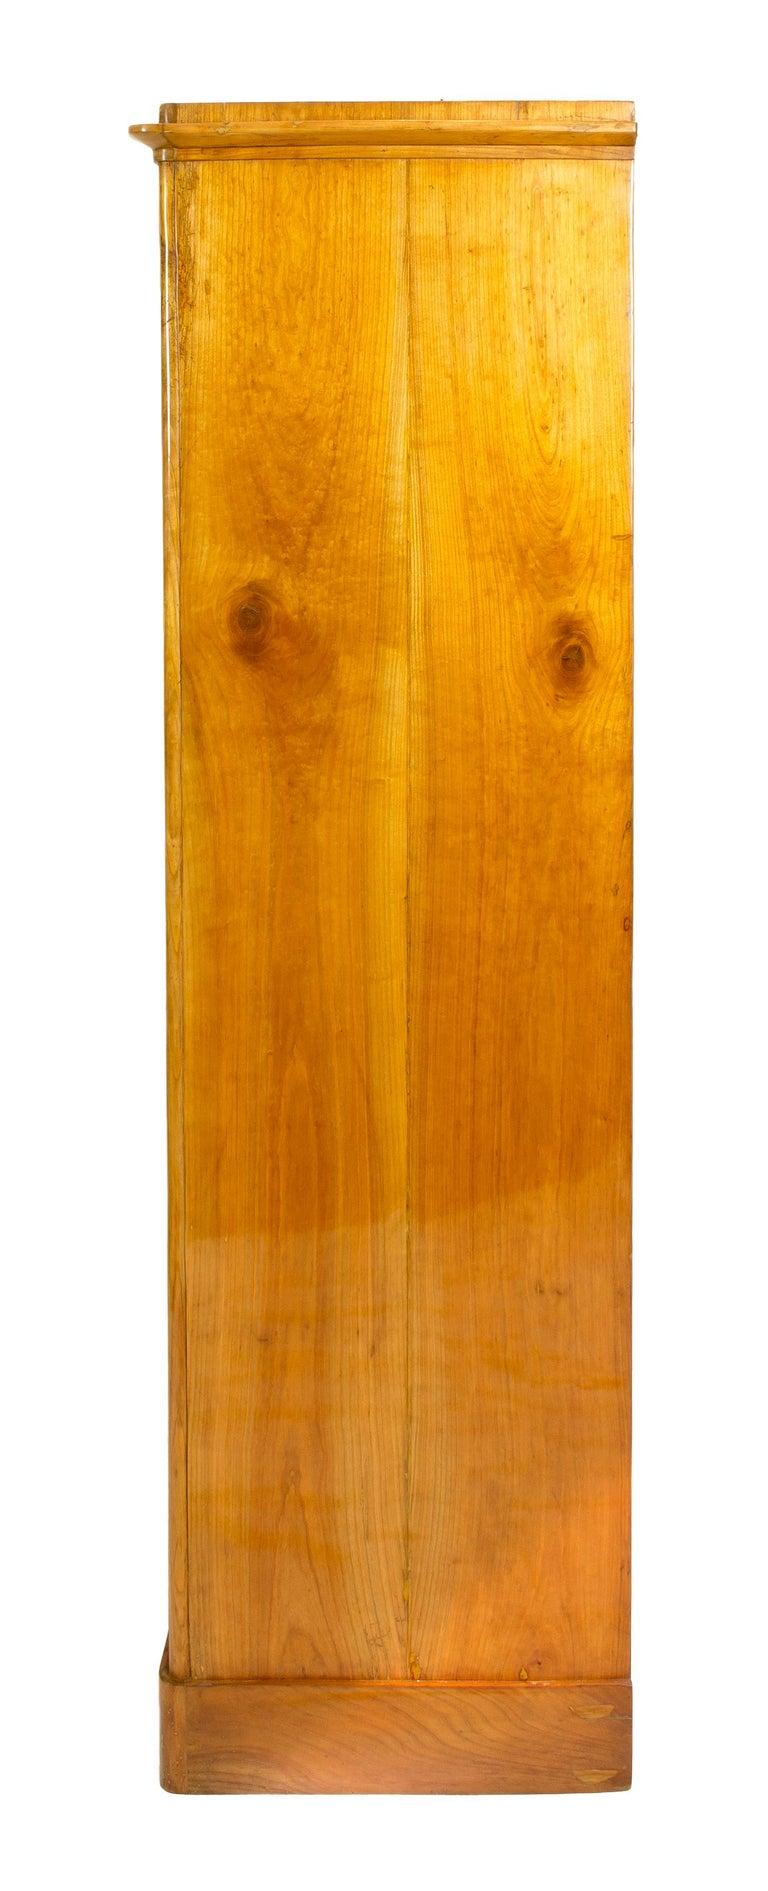 Polished 19th Century One-Door Biedermeier Cherry Cabinet / Wardrobe For Sale